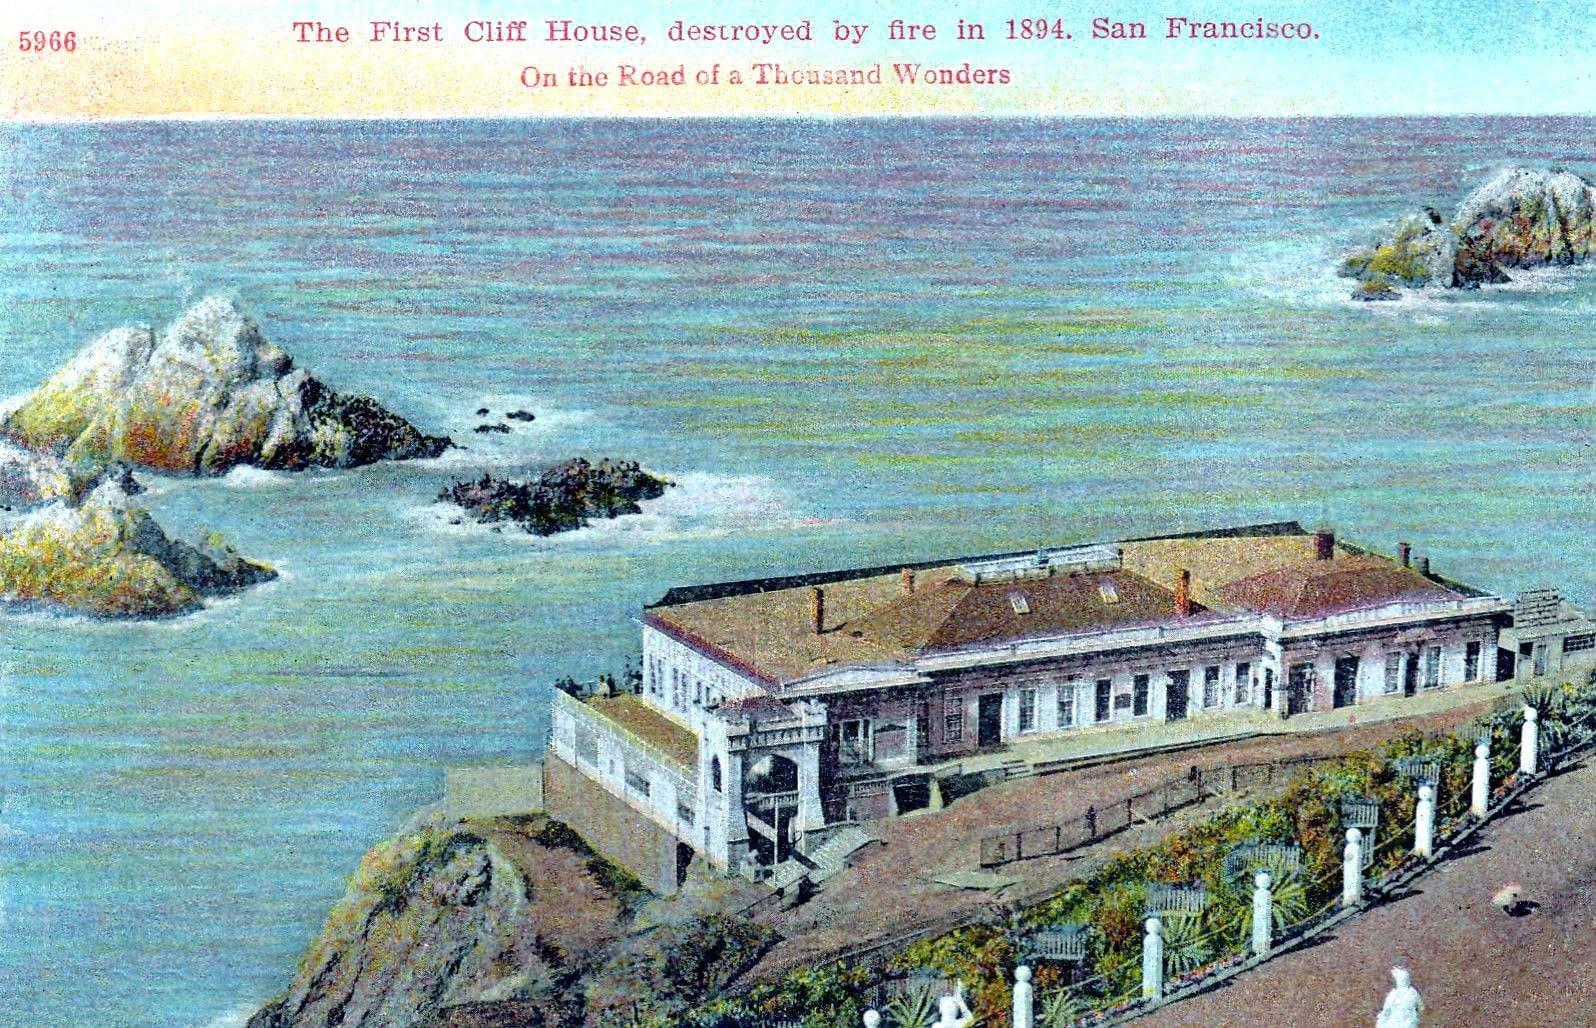 Victorian-era Cliff House - Destroyed in 1894